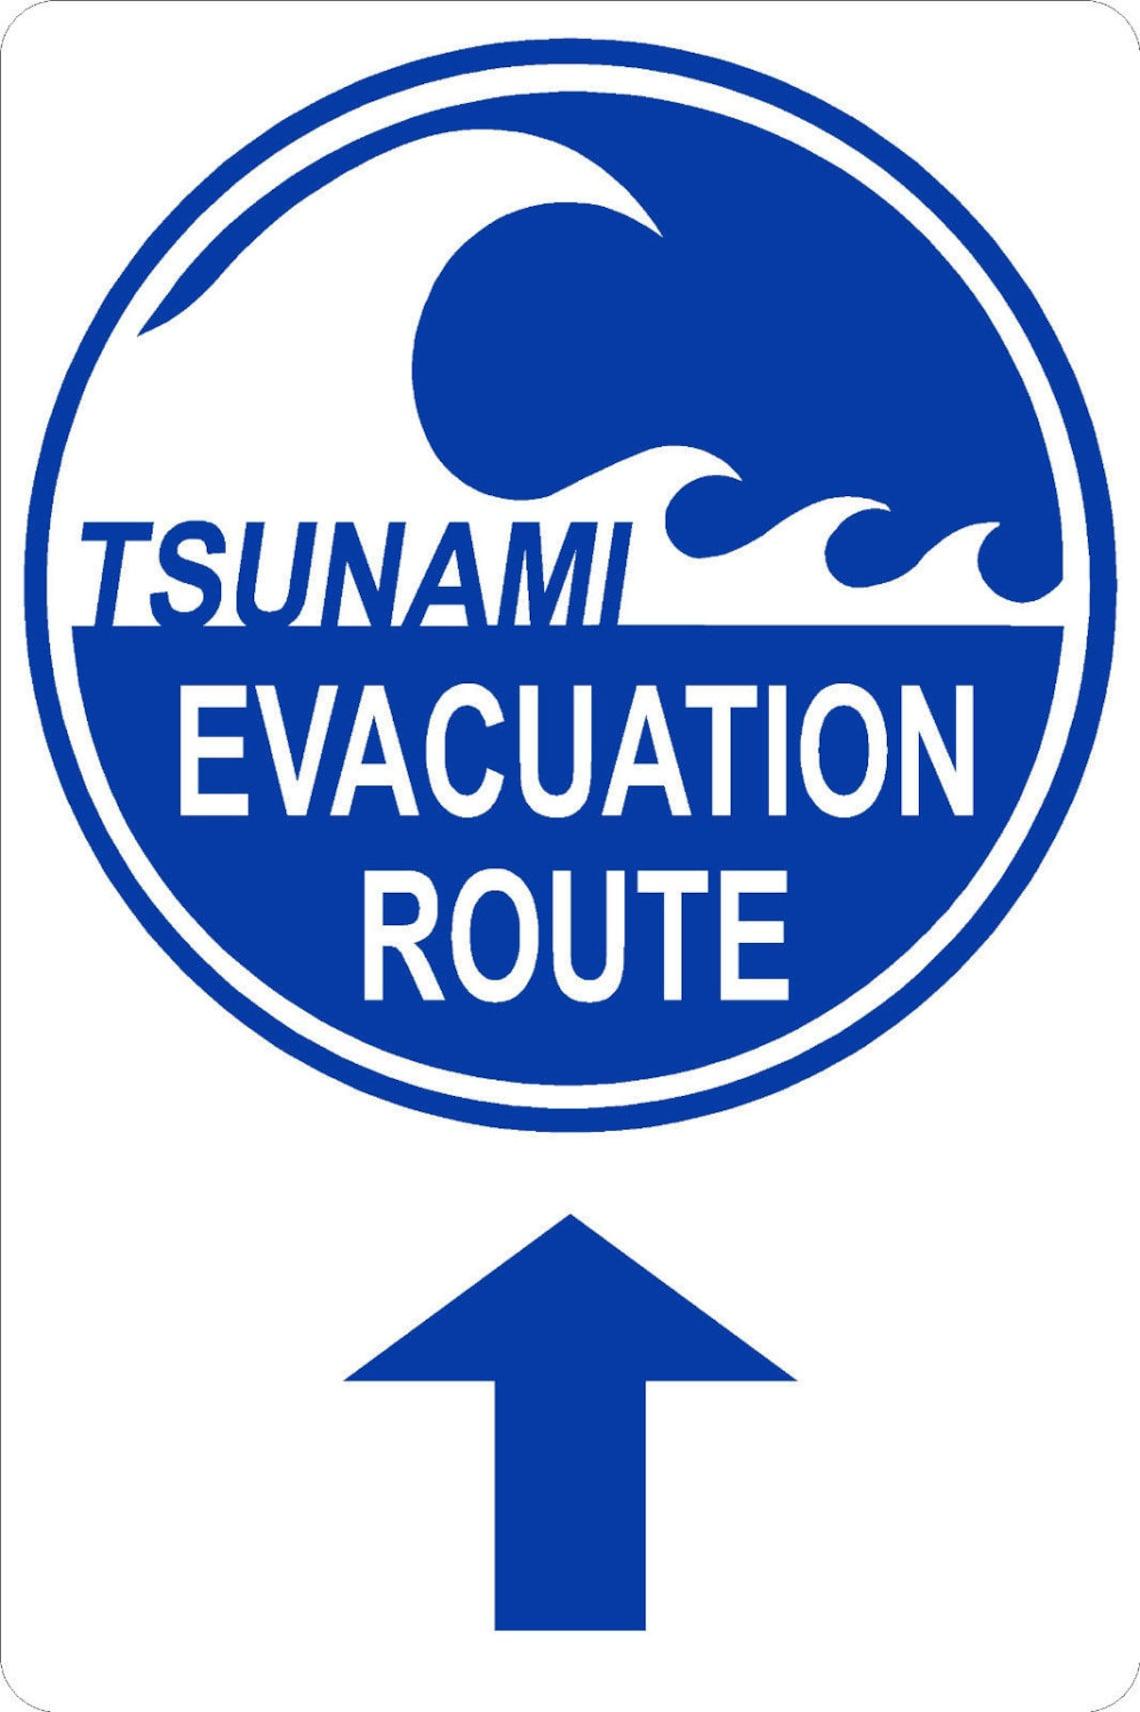 tsunami evacuation route 12x18 thick aluminum sign up